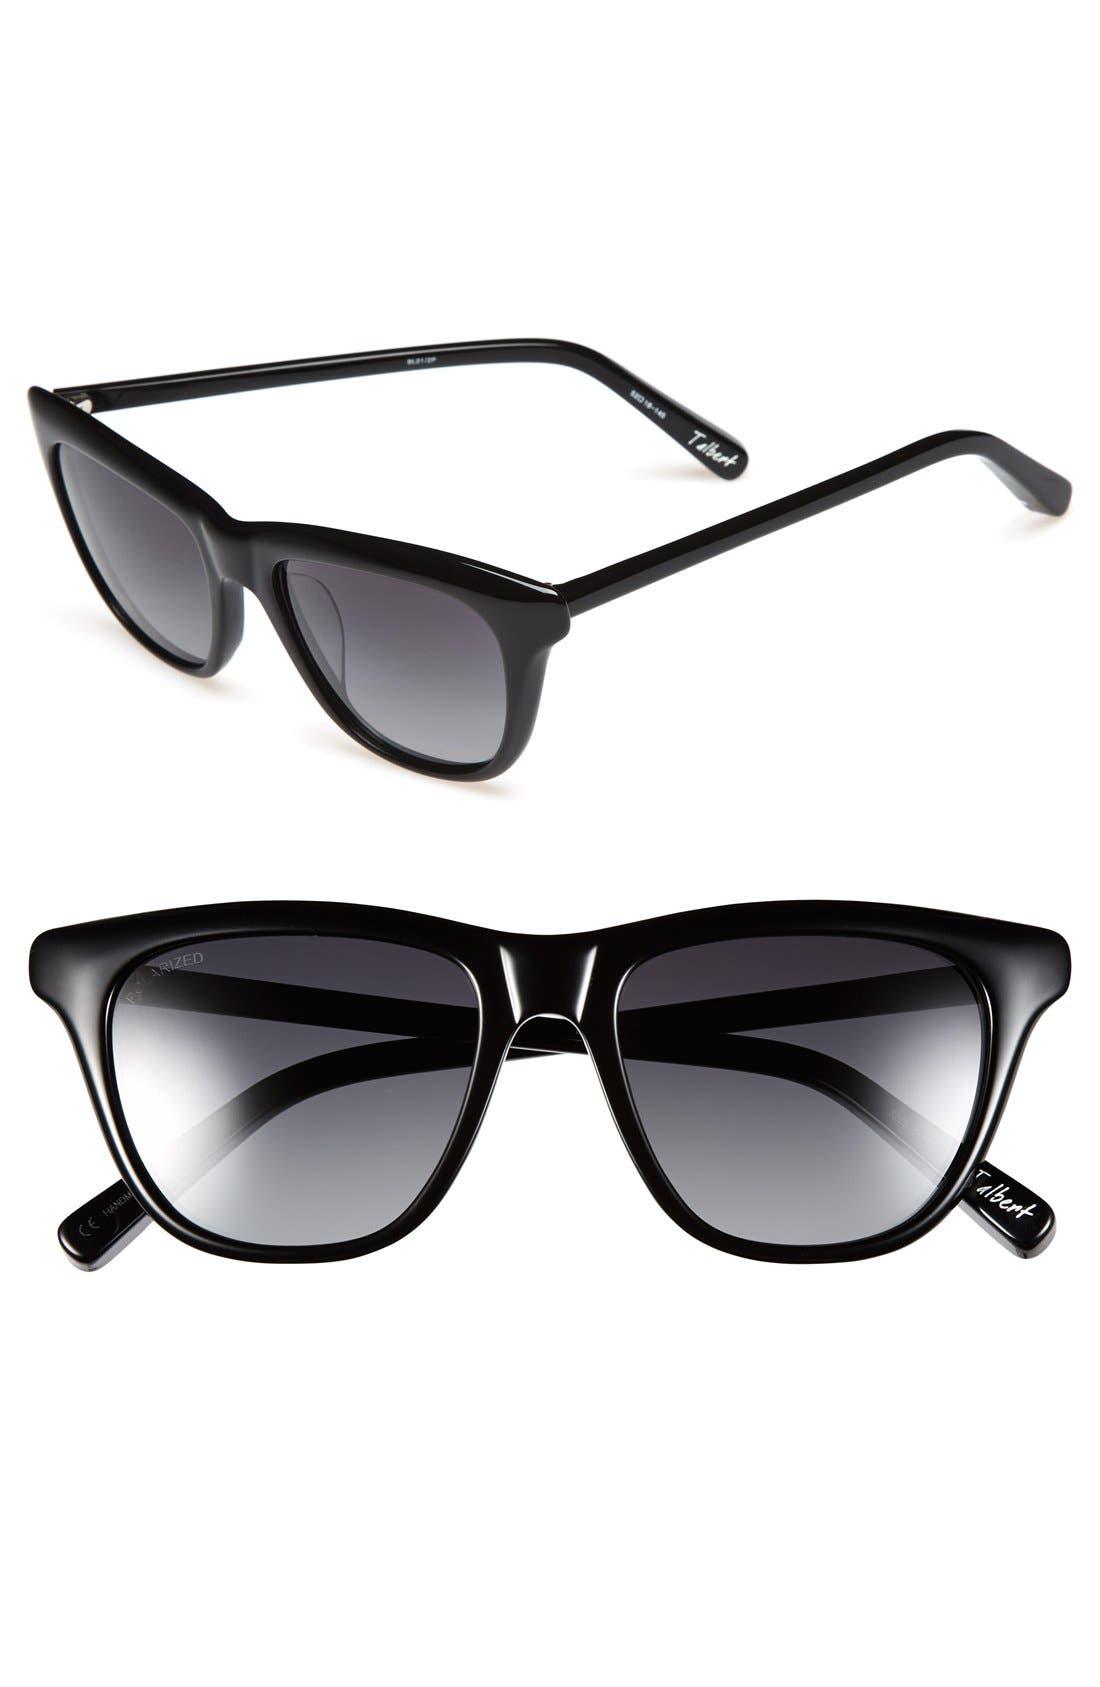 Main Image - Elizabeth and James 'Talbert' 52mm Polarized Sunglasses